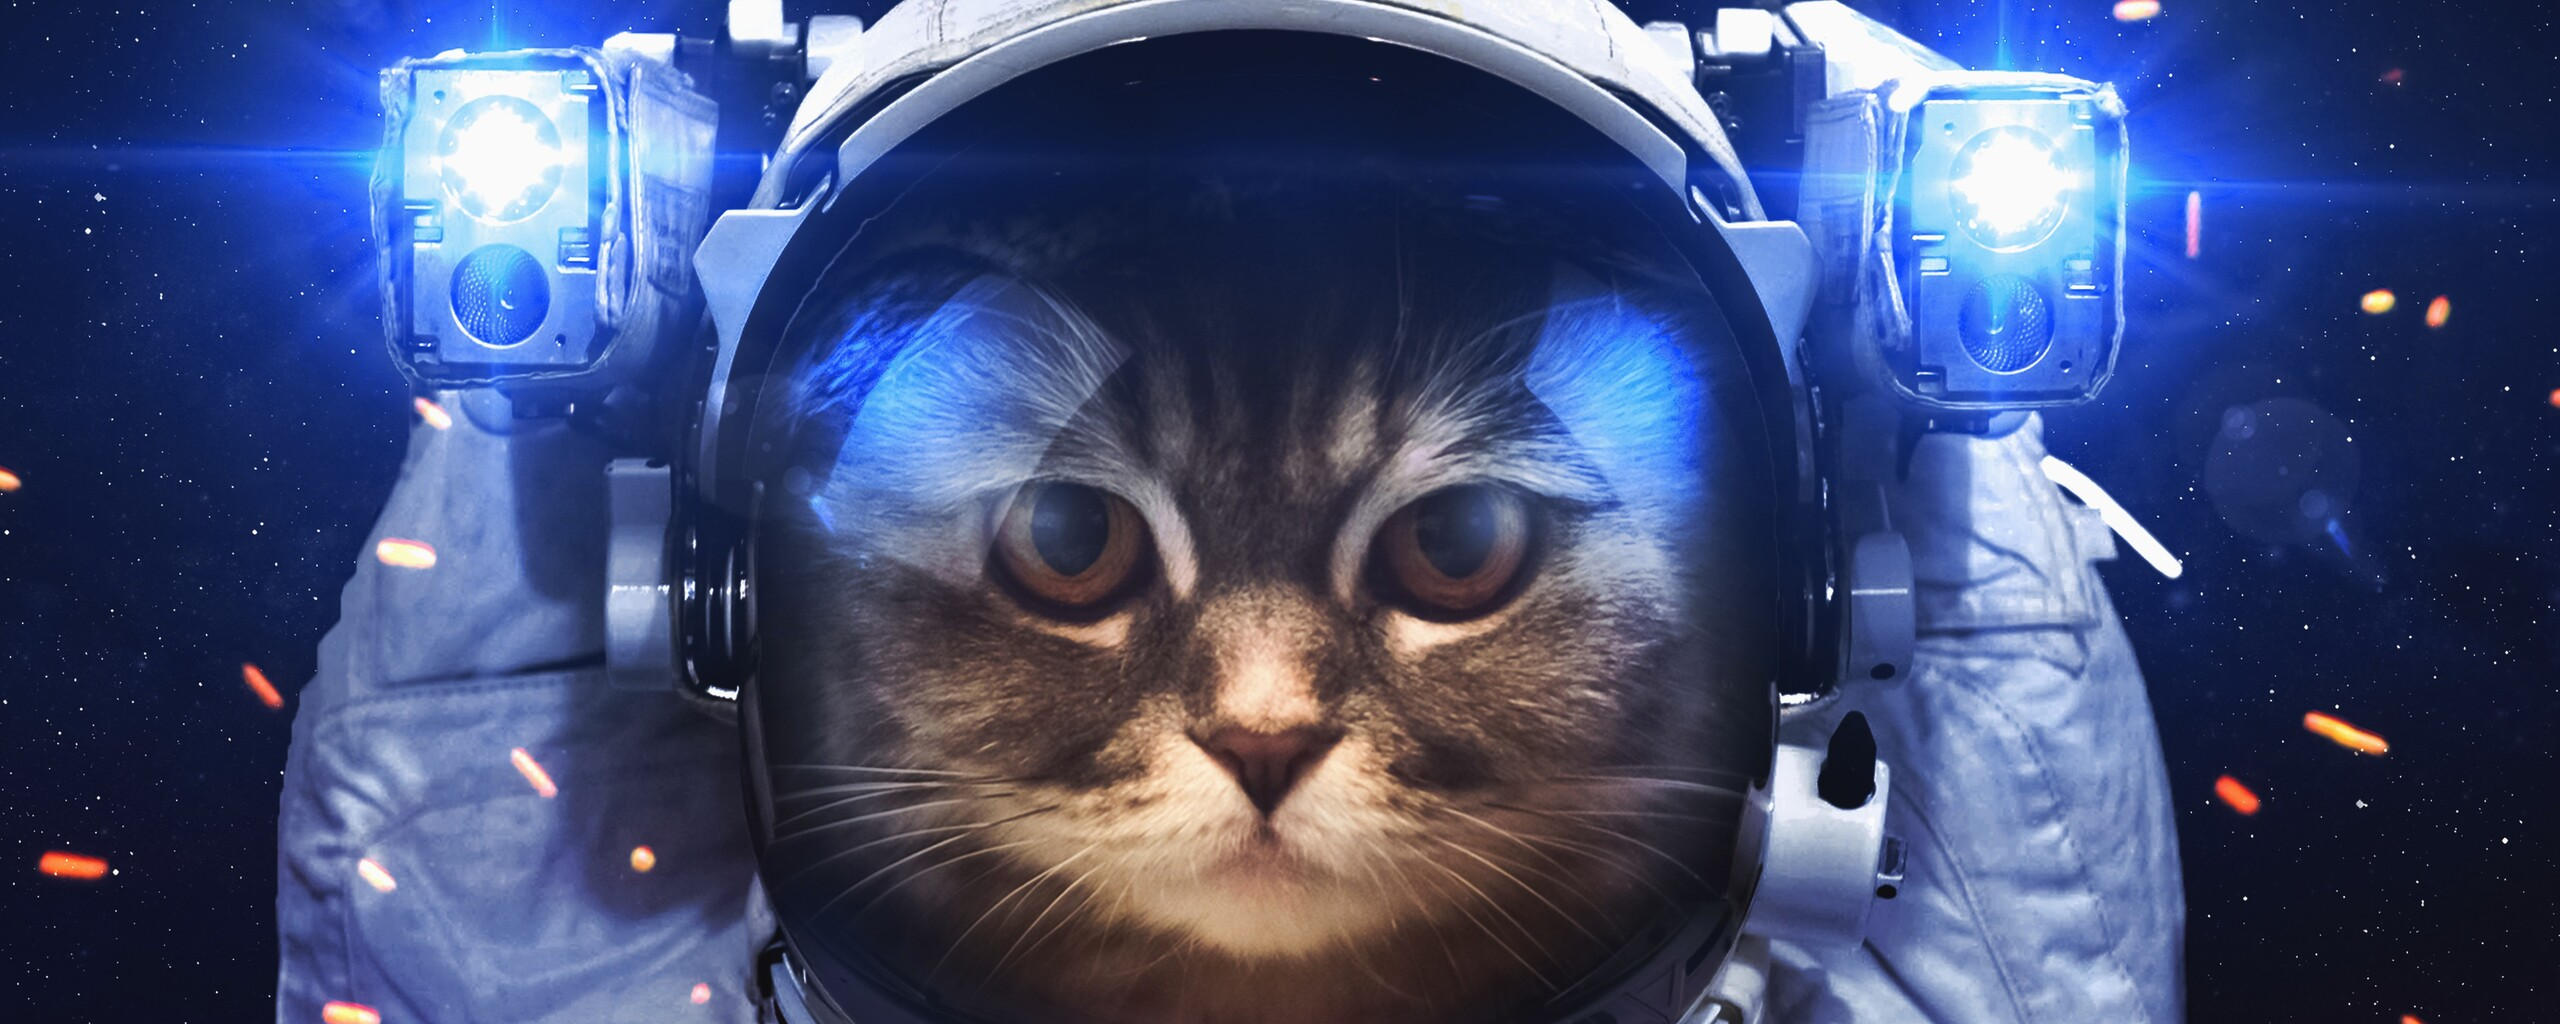 astronaut-cat-fx.jpg